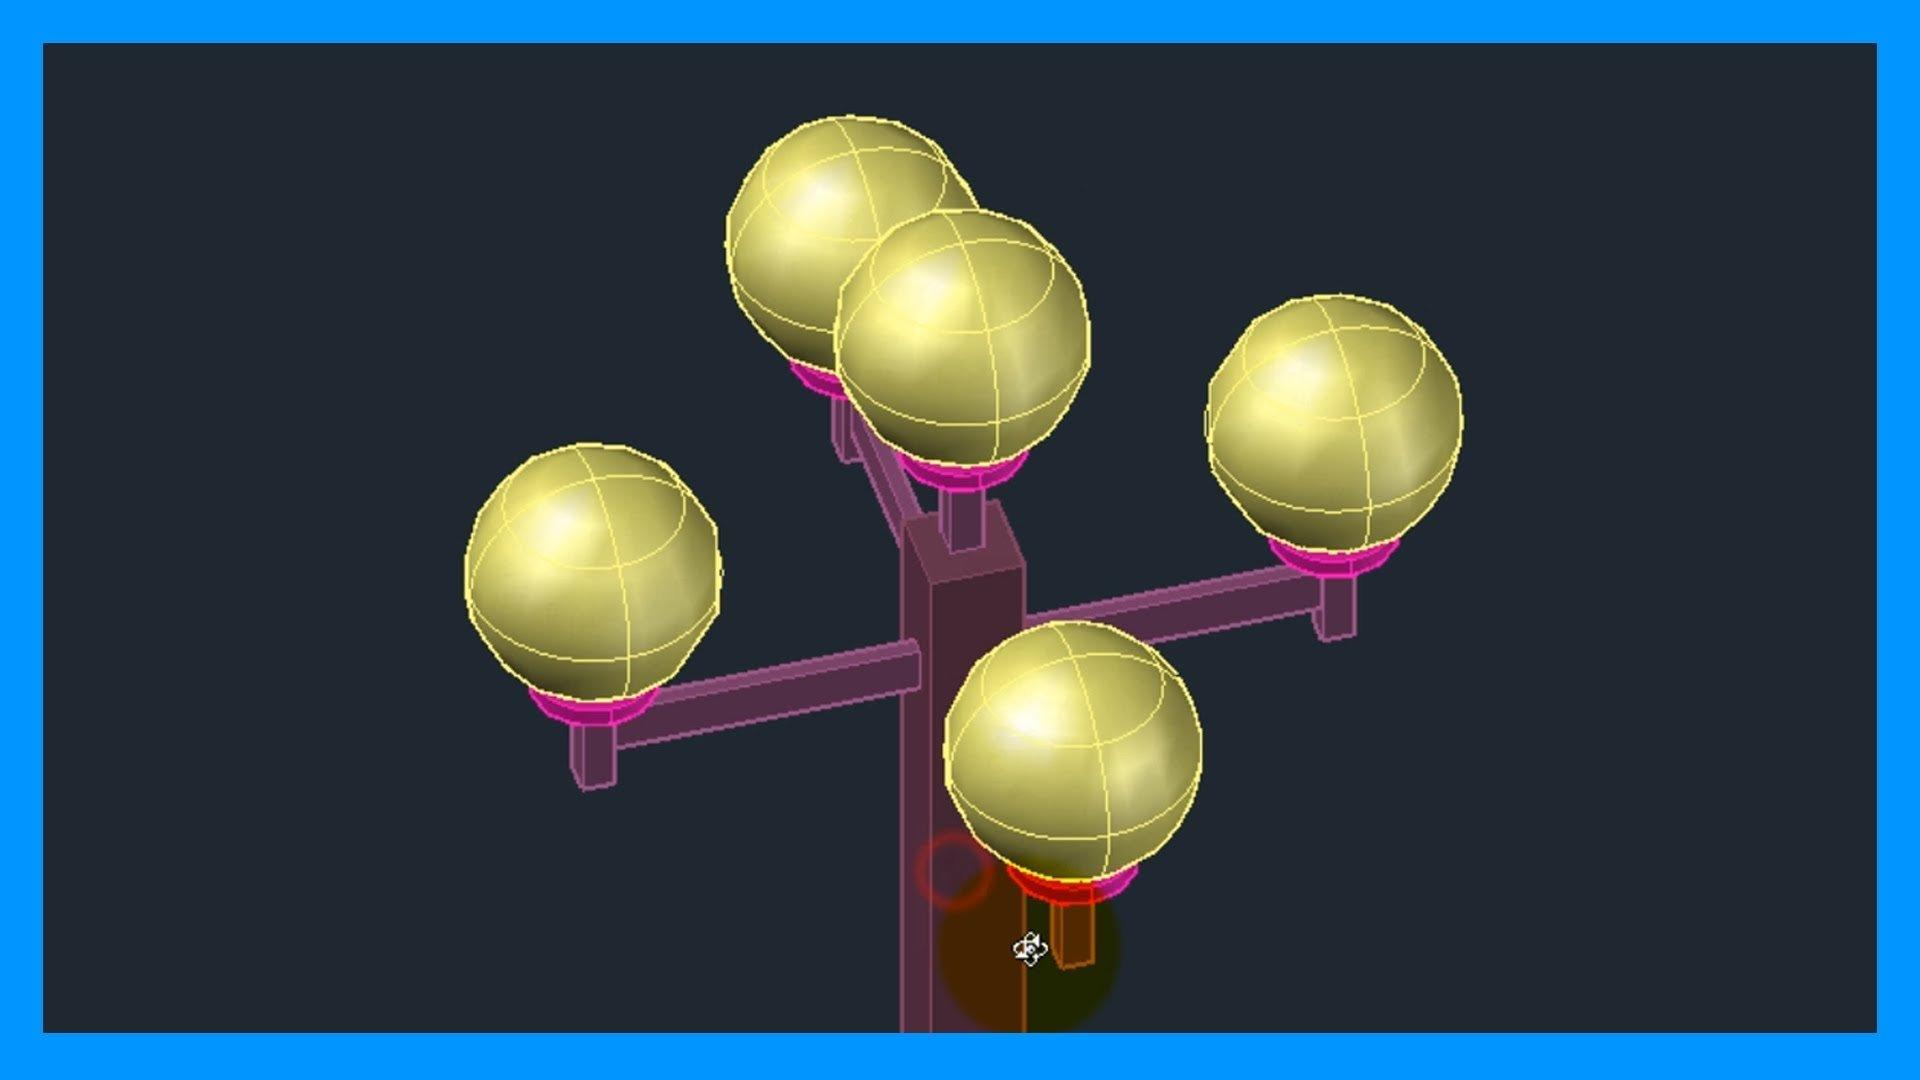 Autocad – 7/7 Iniciación 3D, básico 3D: Modelado de farola 3D paso a paso.